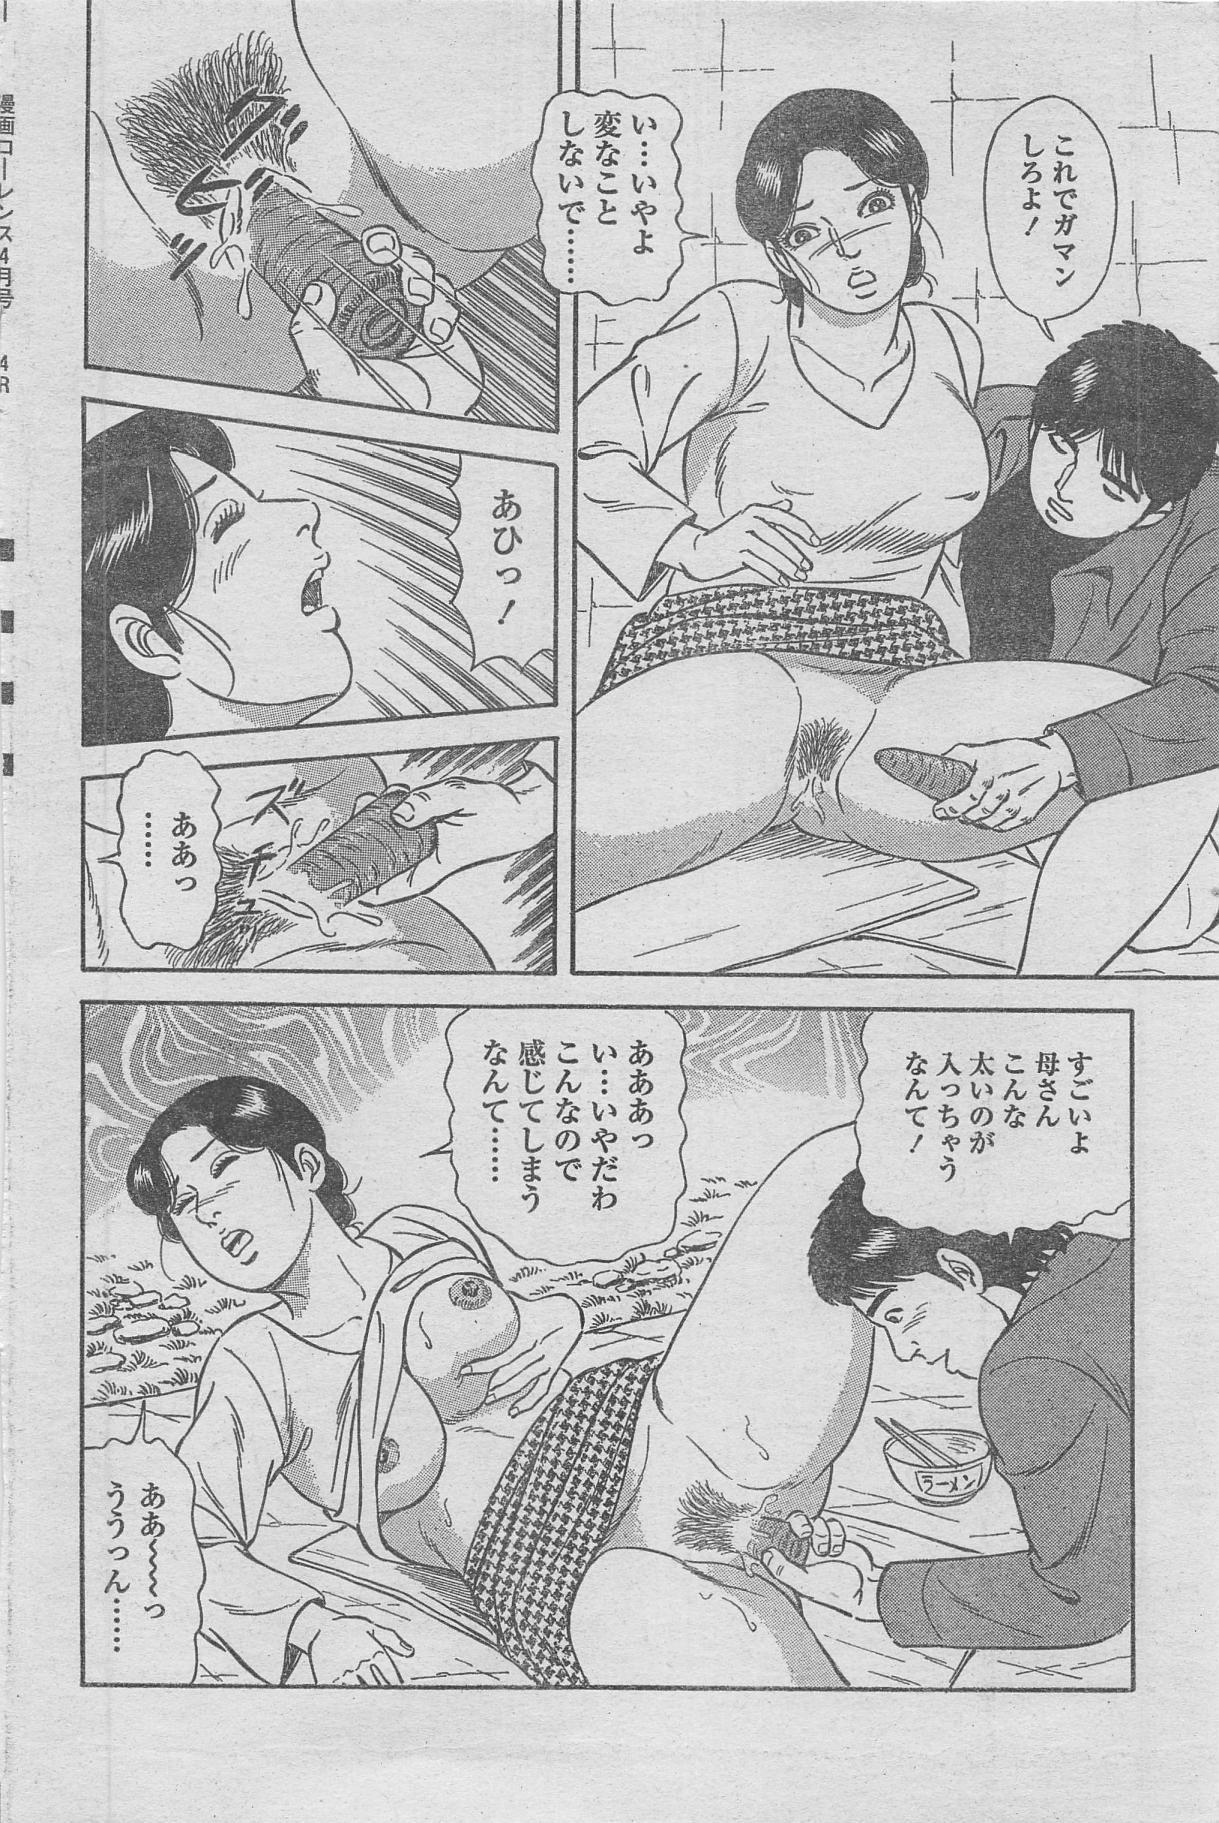 Manga Lawrence 2013-04 121